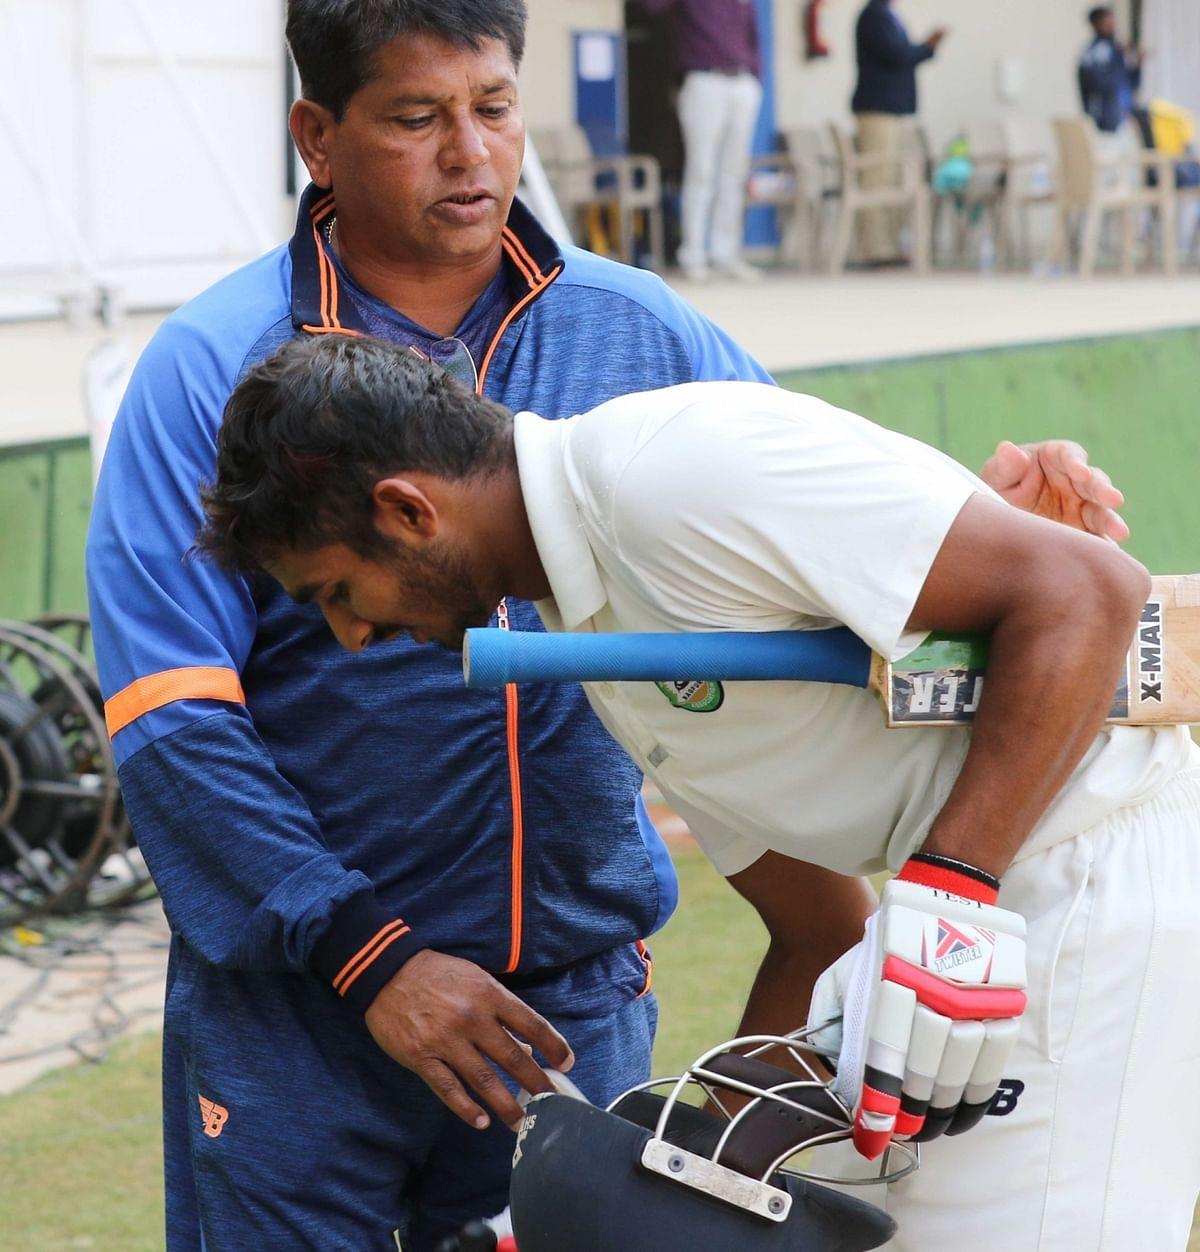 Akshay Wadkar of Vidarbha celebrates his century with coach Pandit on the third day of Ranji Trophy Final between Vidarbha and Delhi in Indore on Dec 31, 2017.